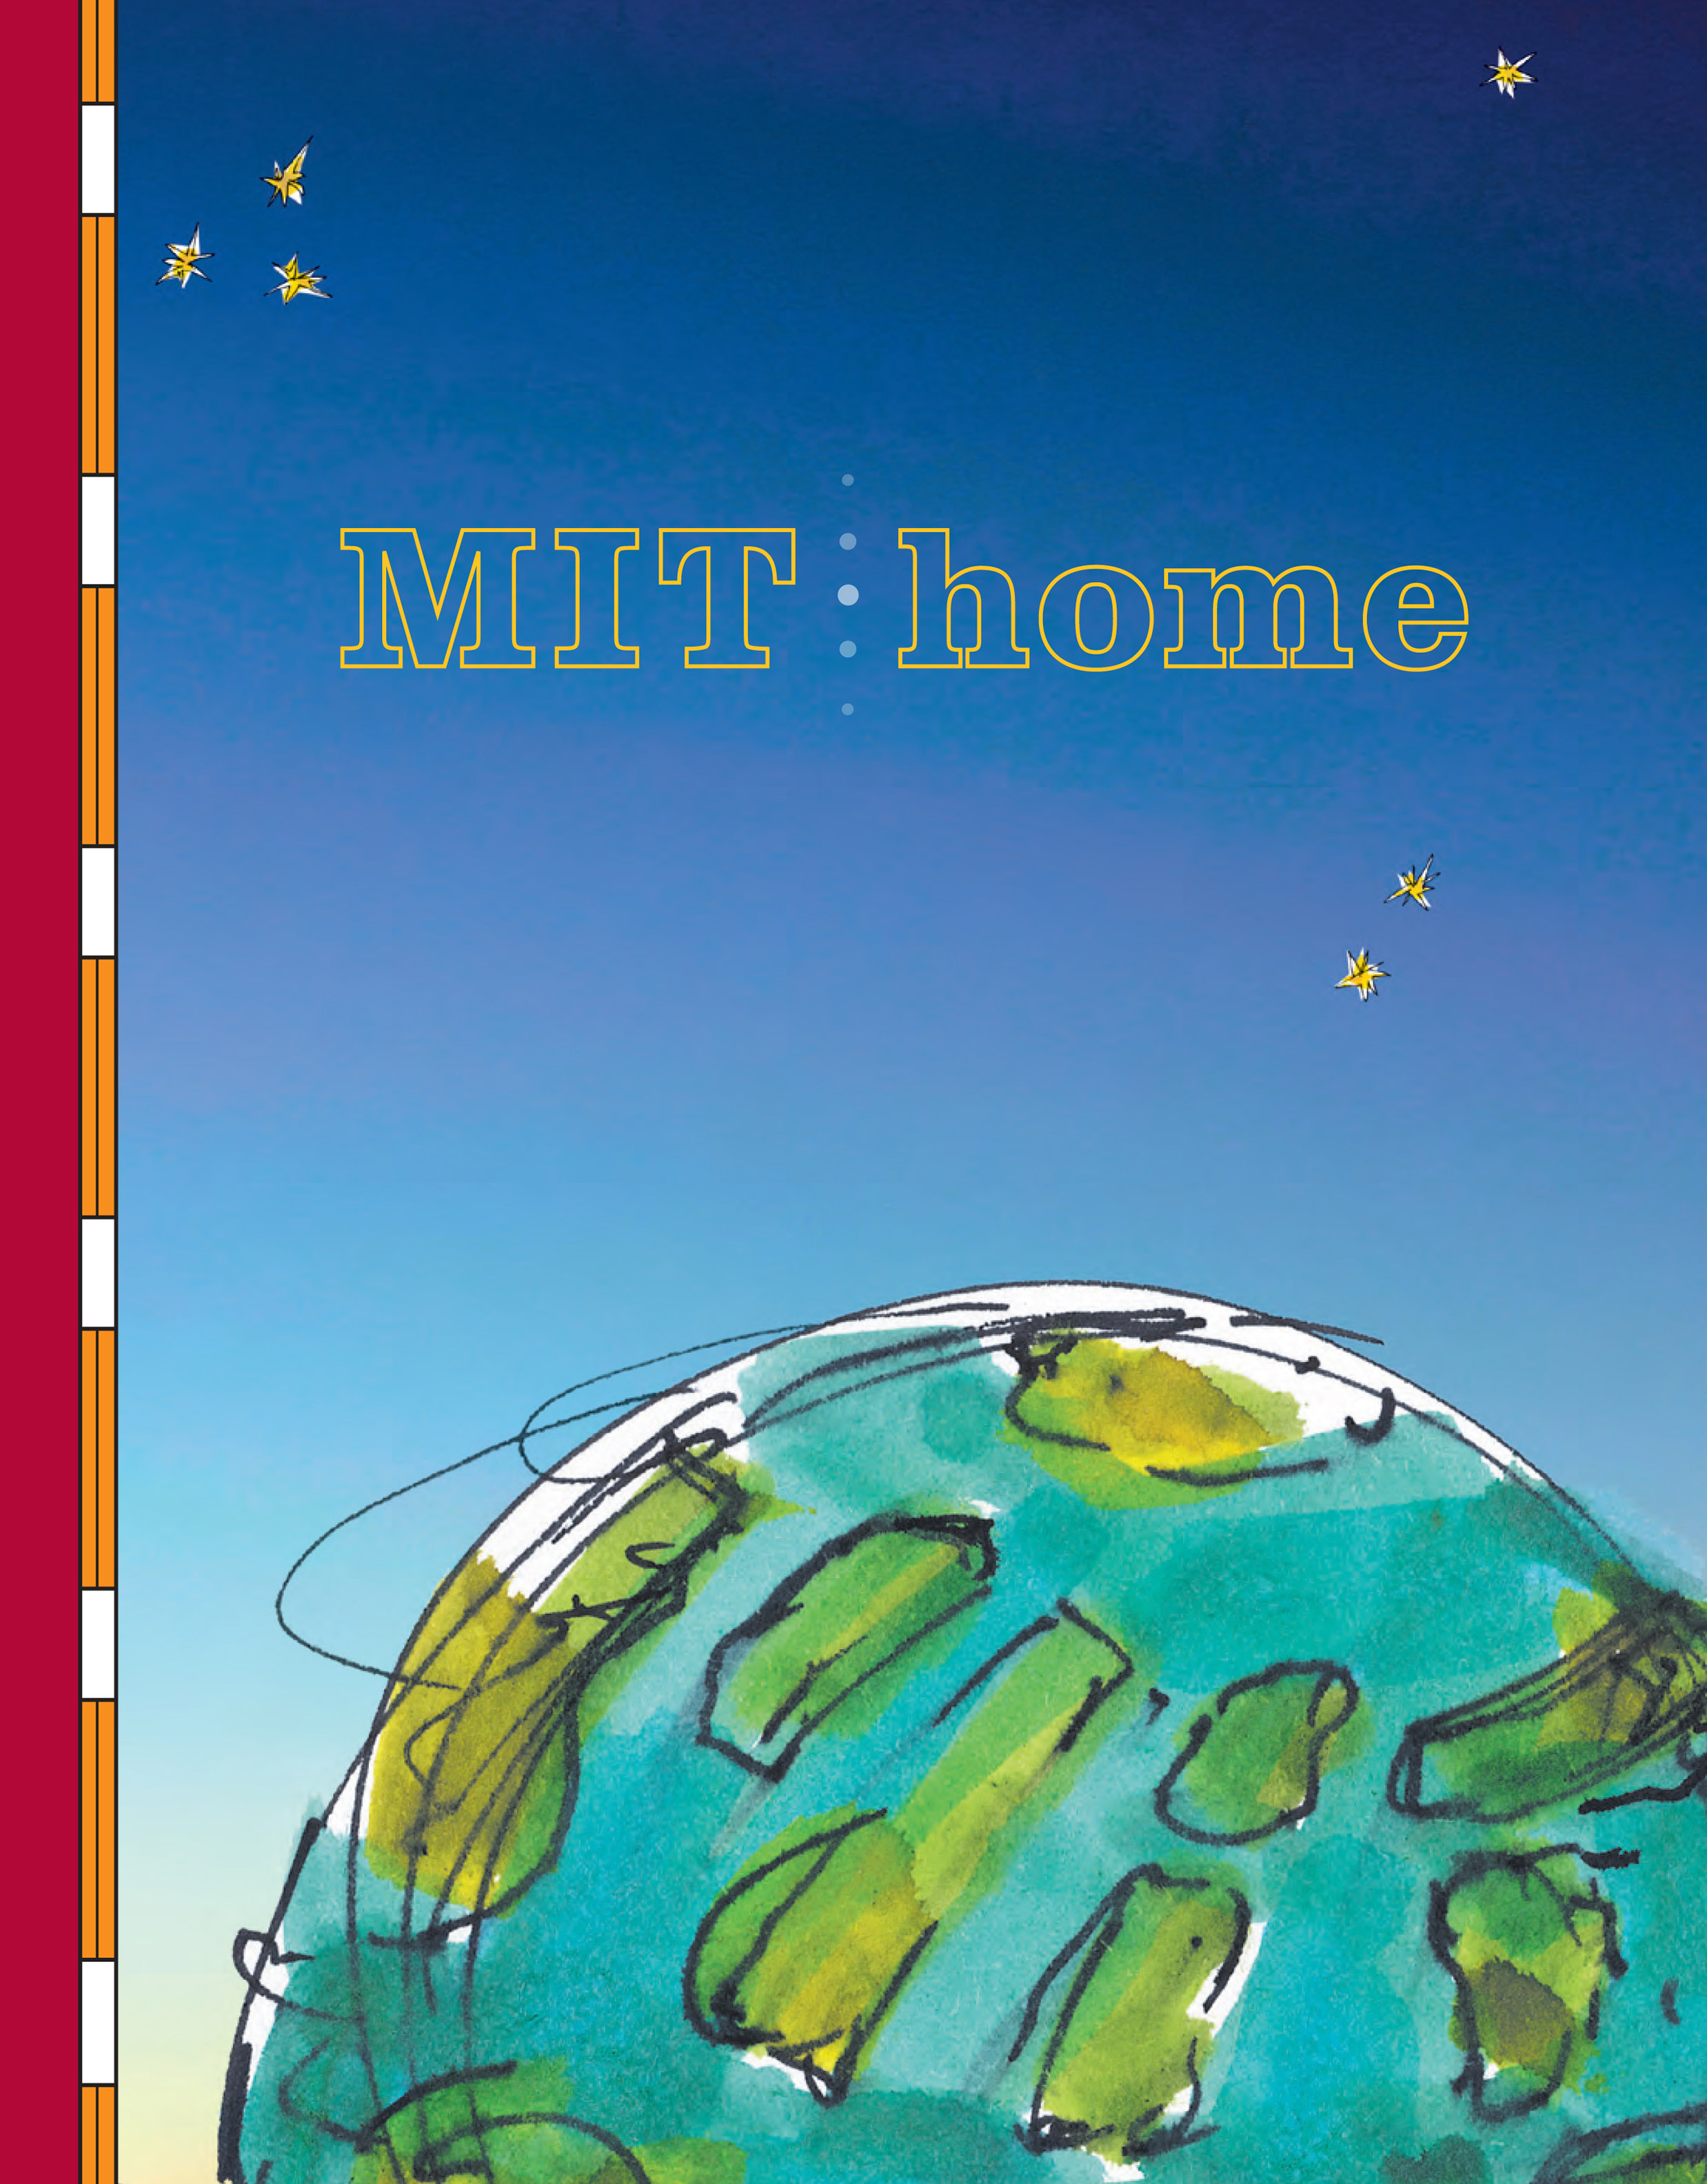 10-2006-mit-vbook-1cover-1lrgmed.jpg